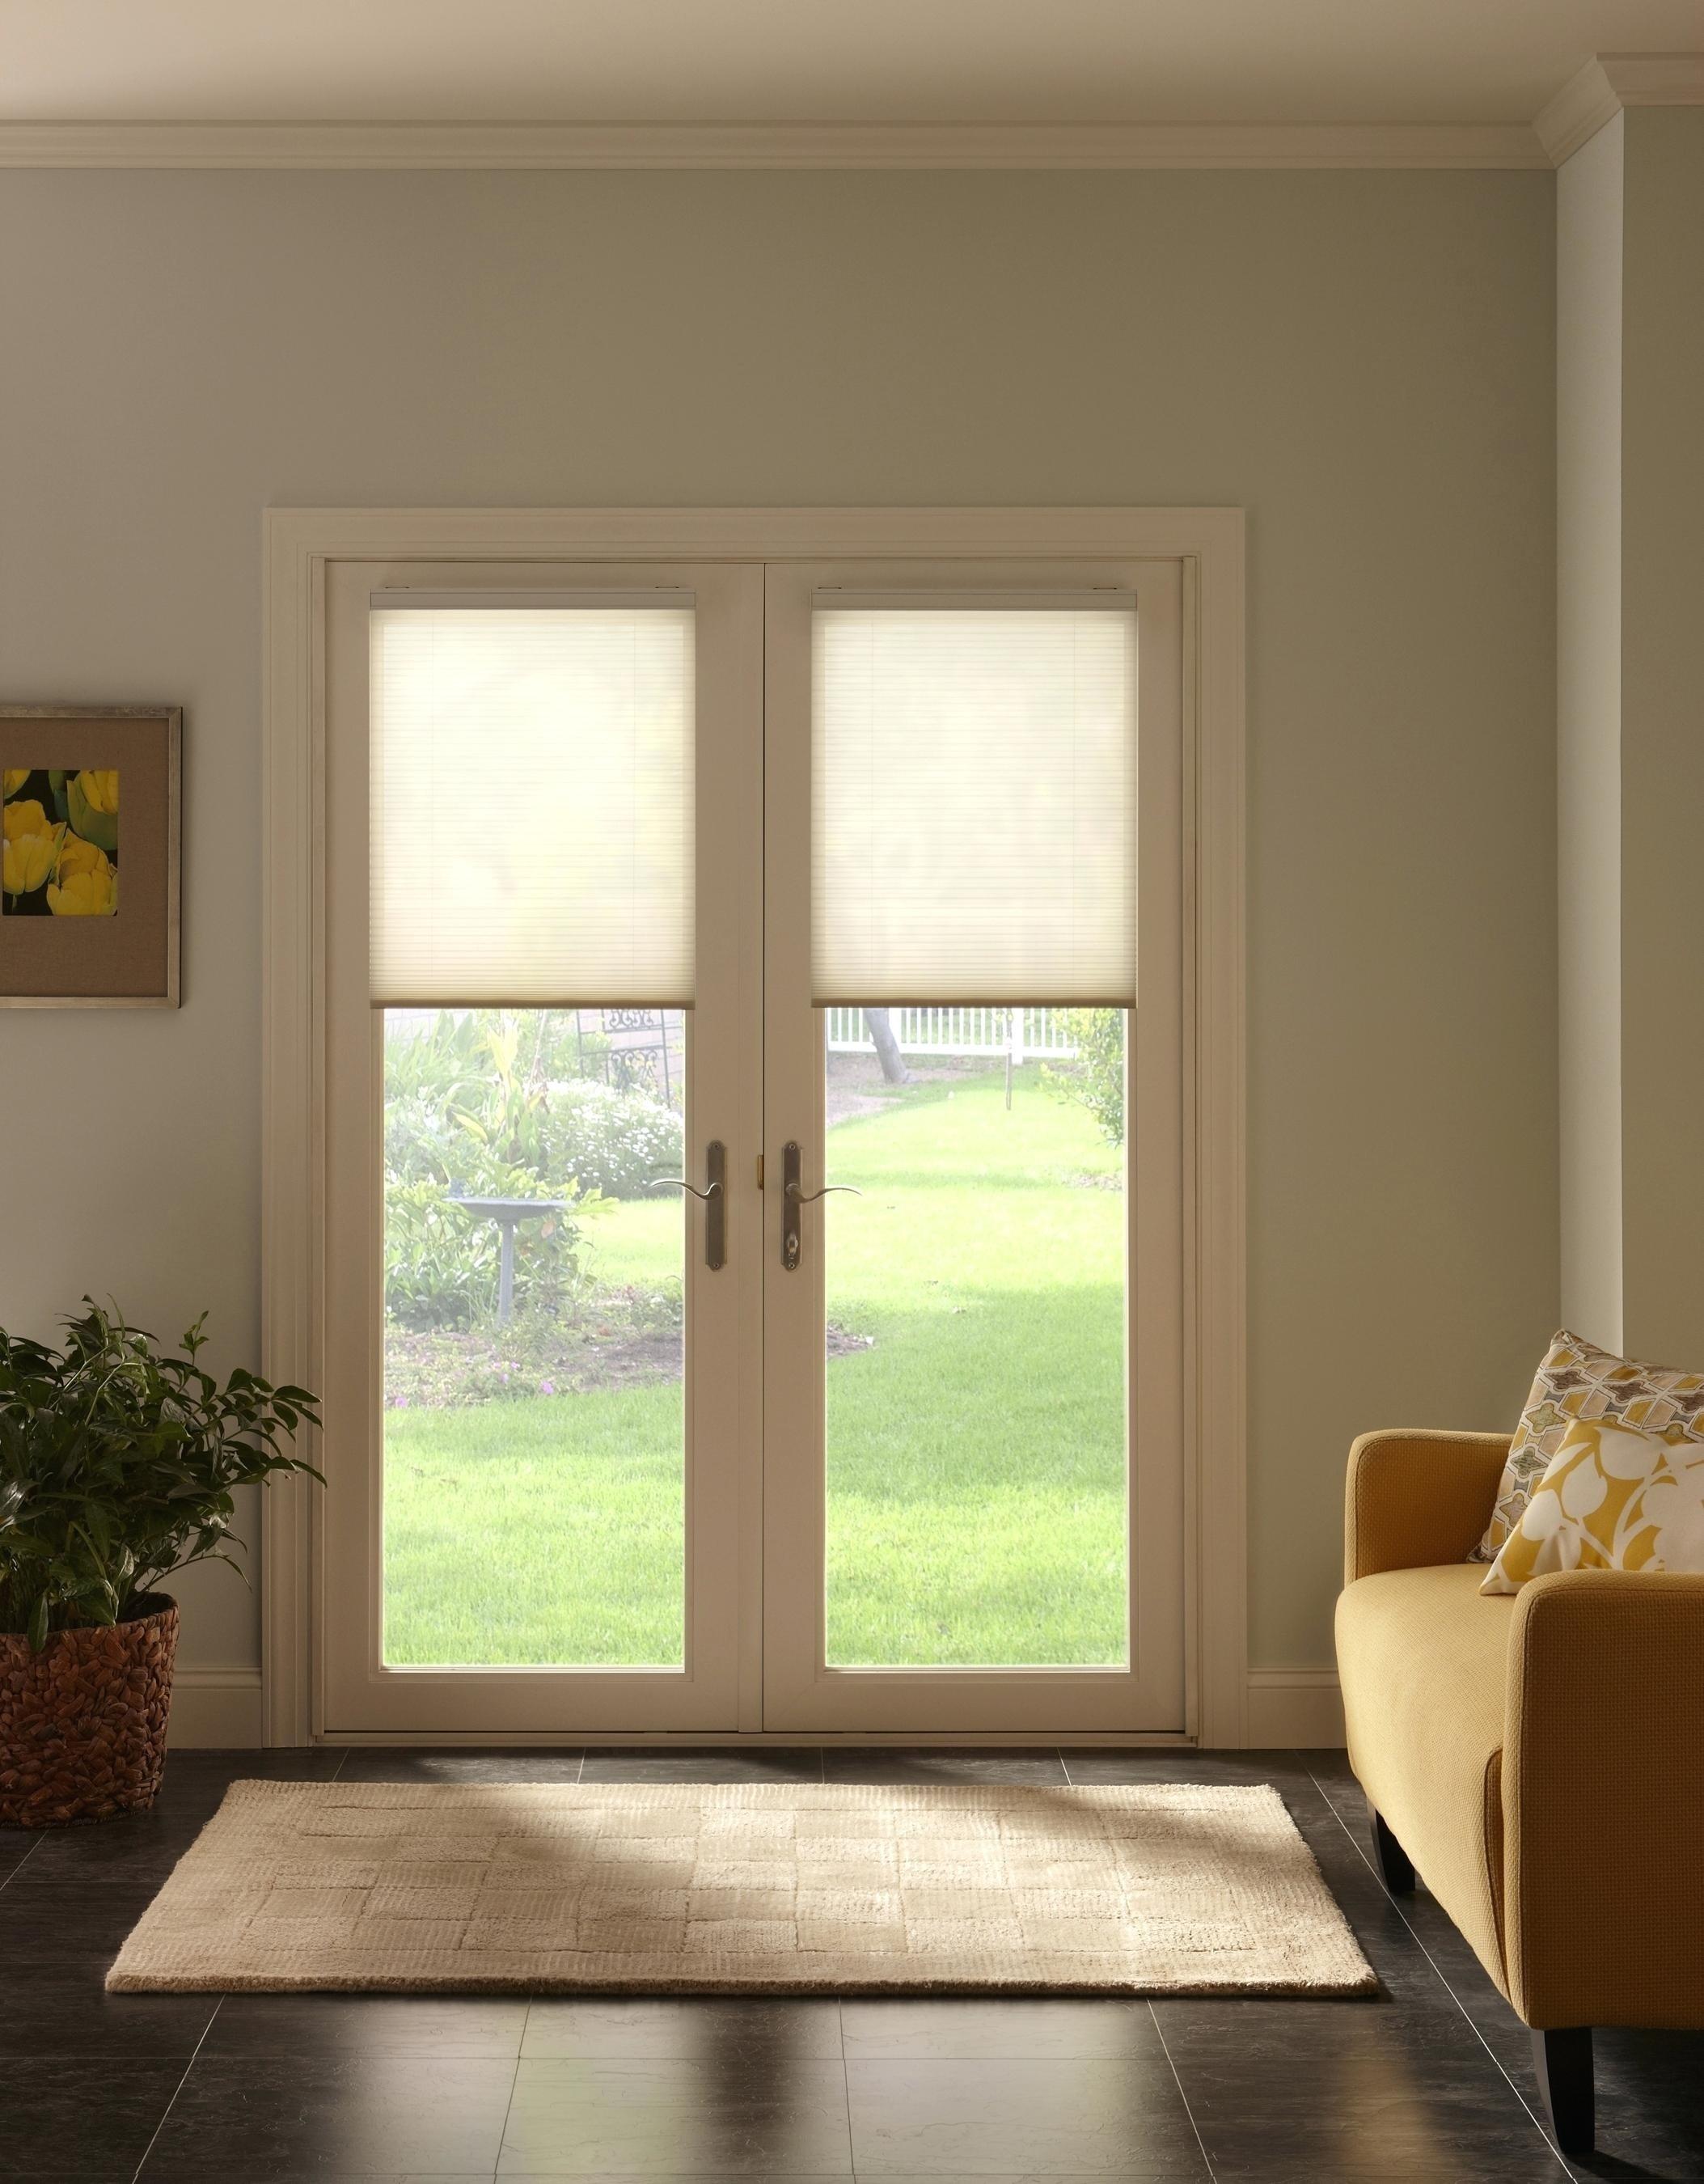 10 Elegant Window Treatment Ideas For French Doors decoration french door window treatments ideas 2020